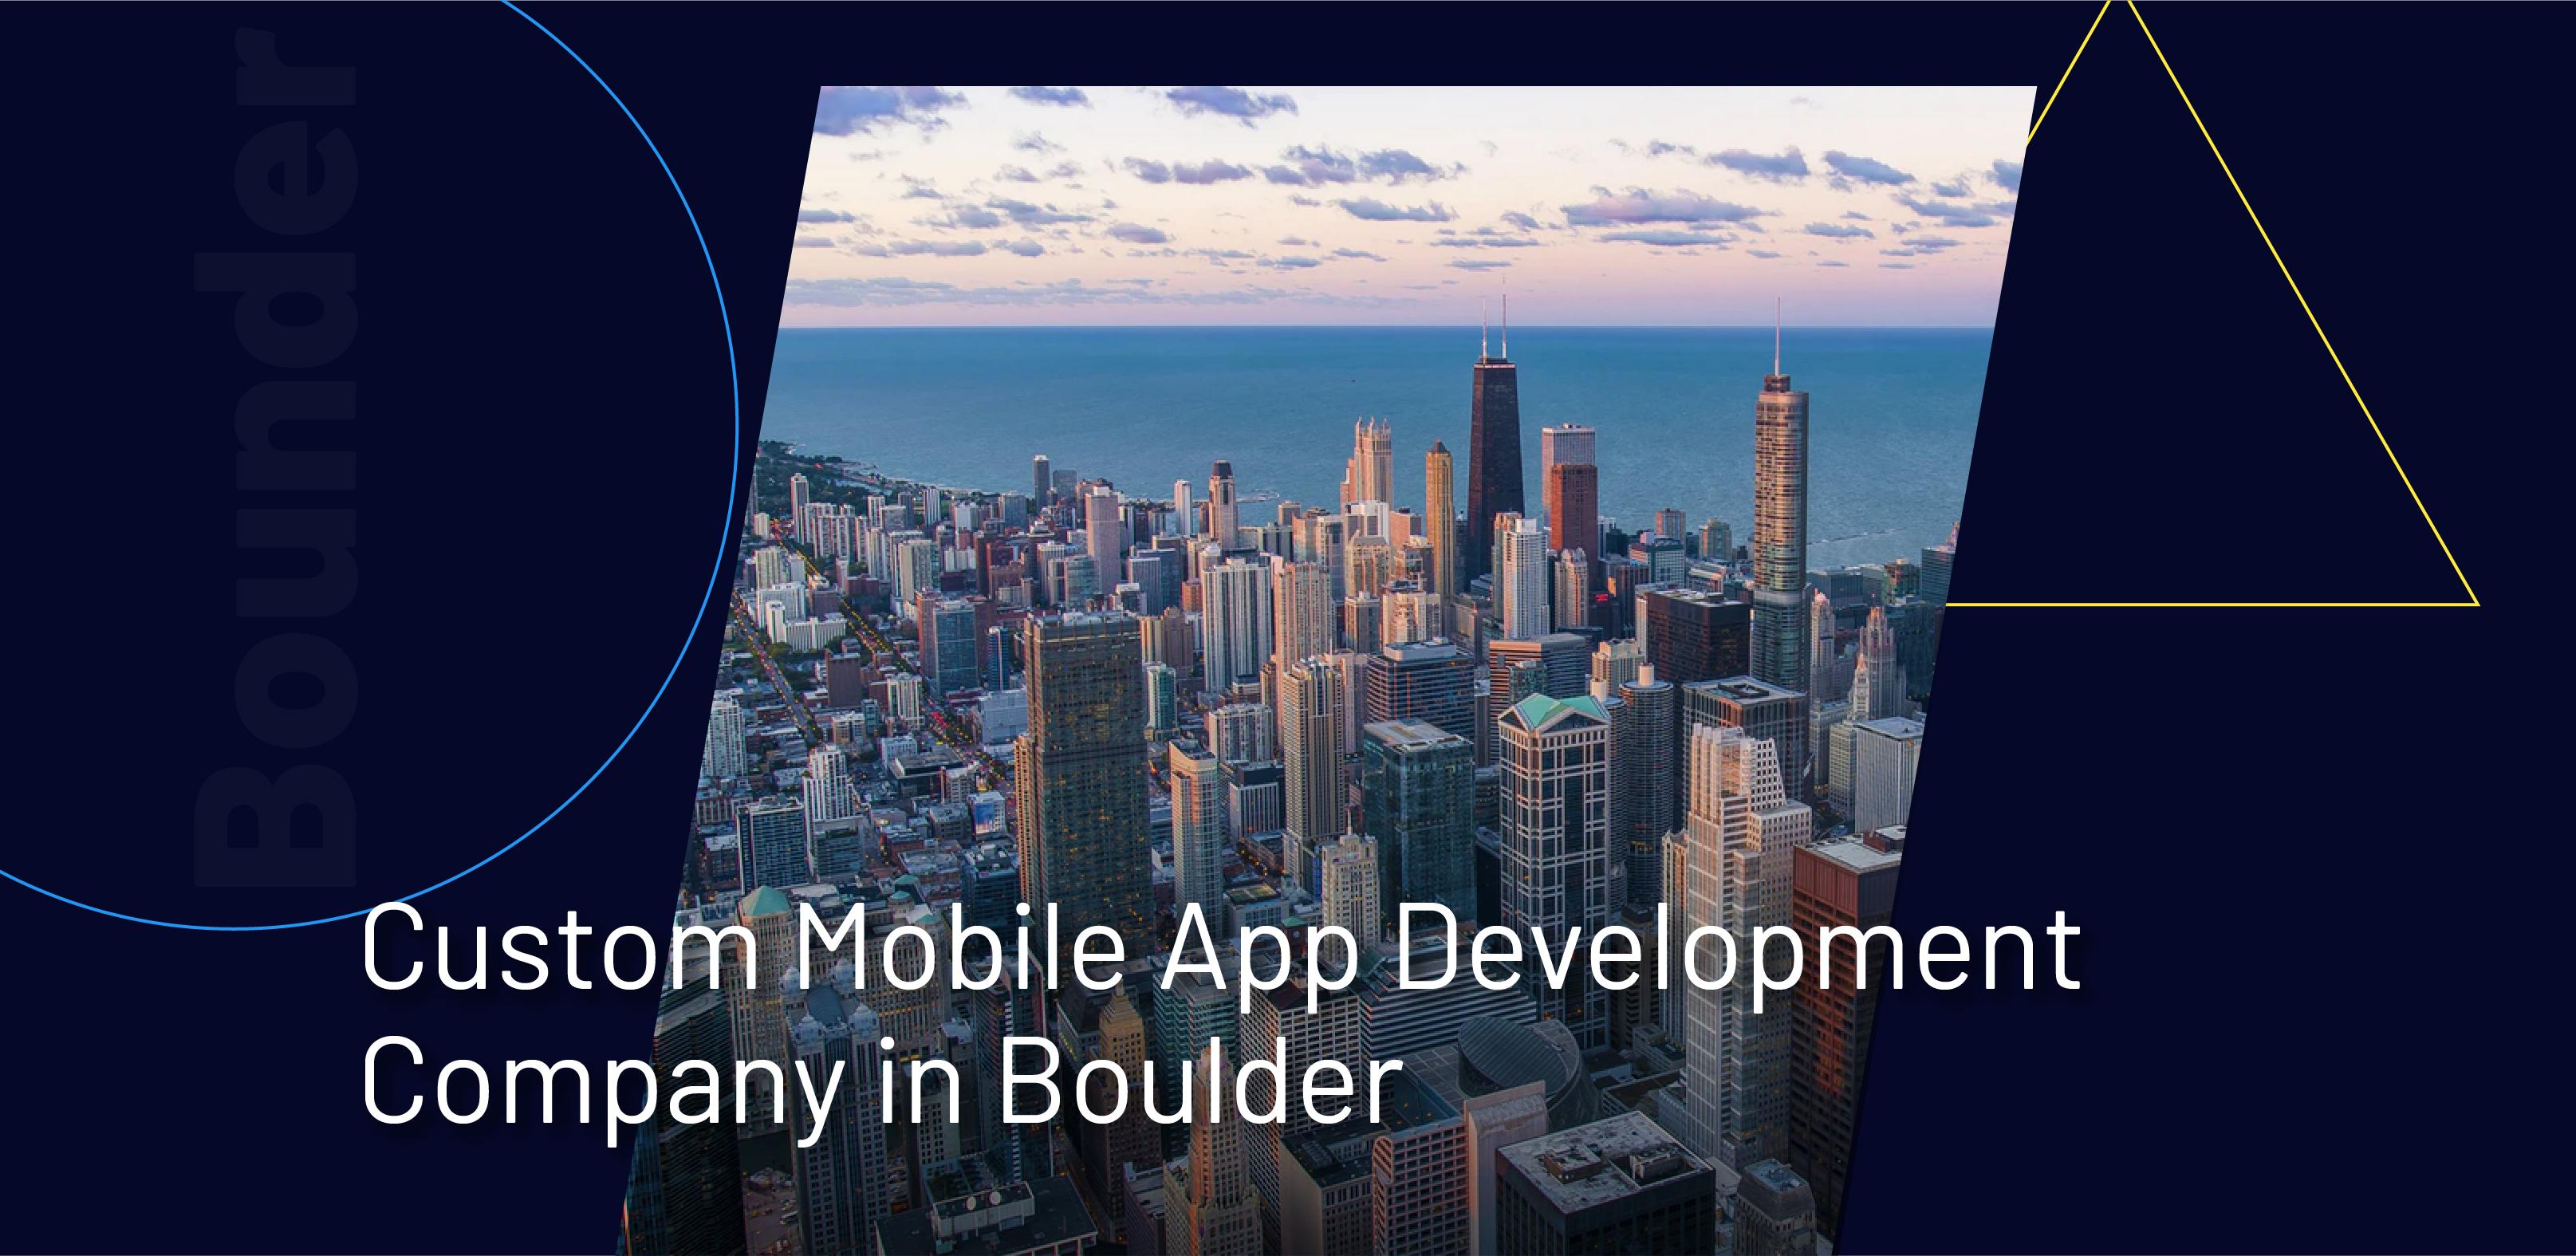 Custom Mobile App Development Company in Boulder - WebClues Infotech